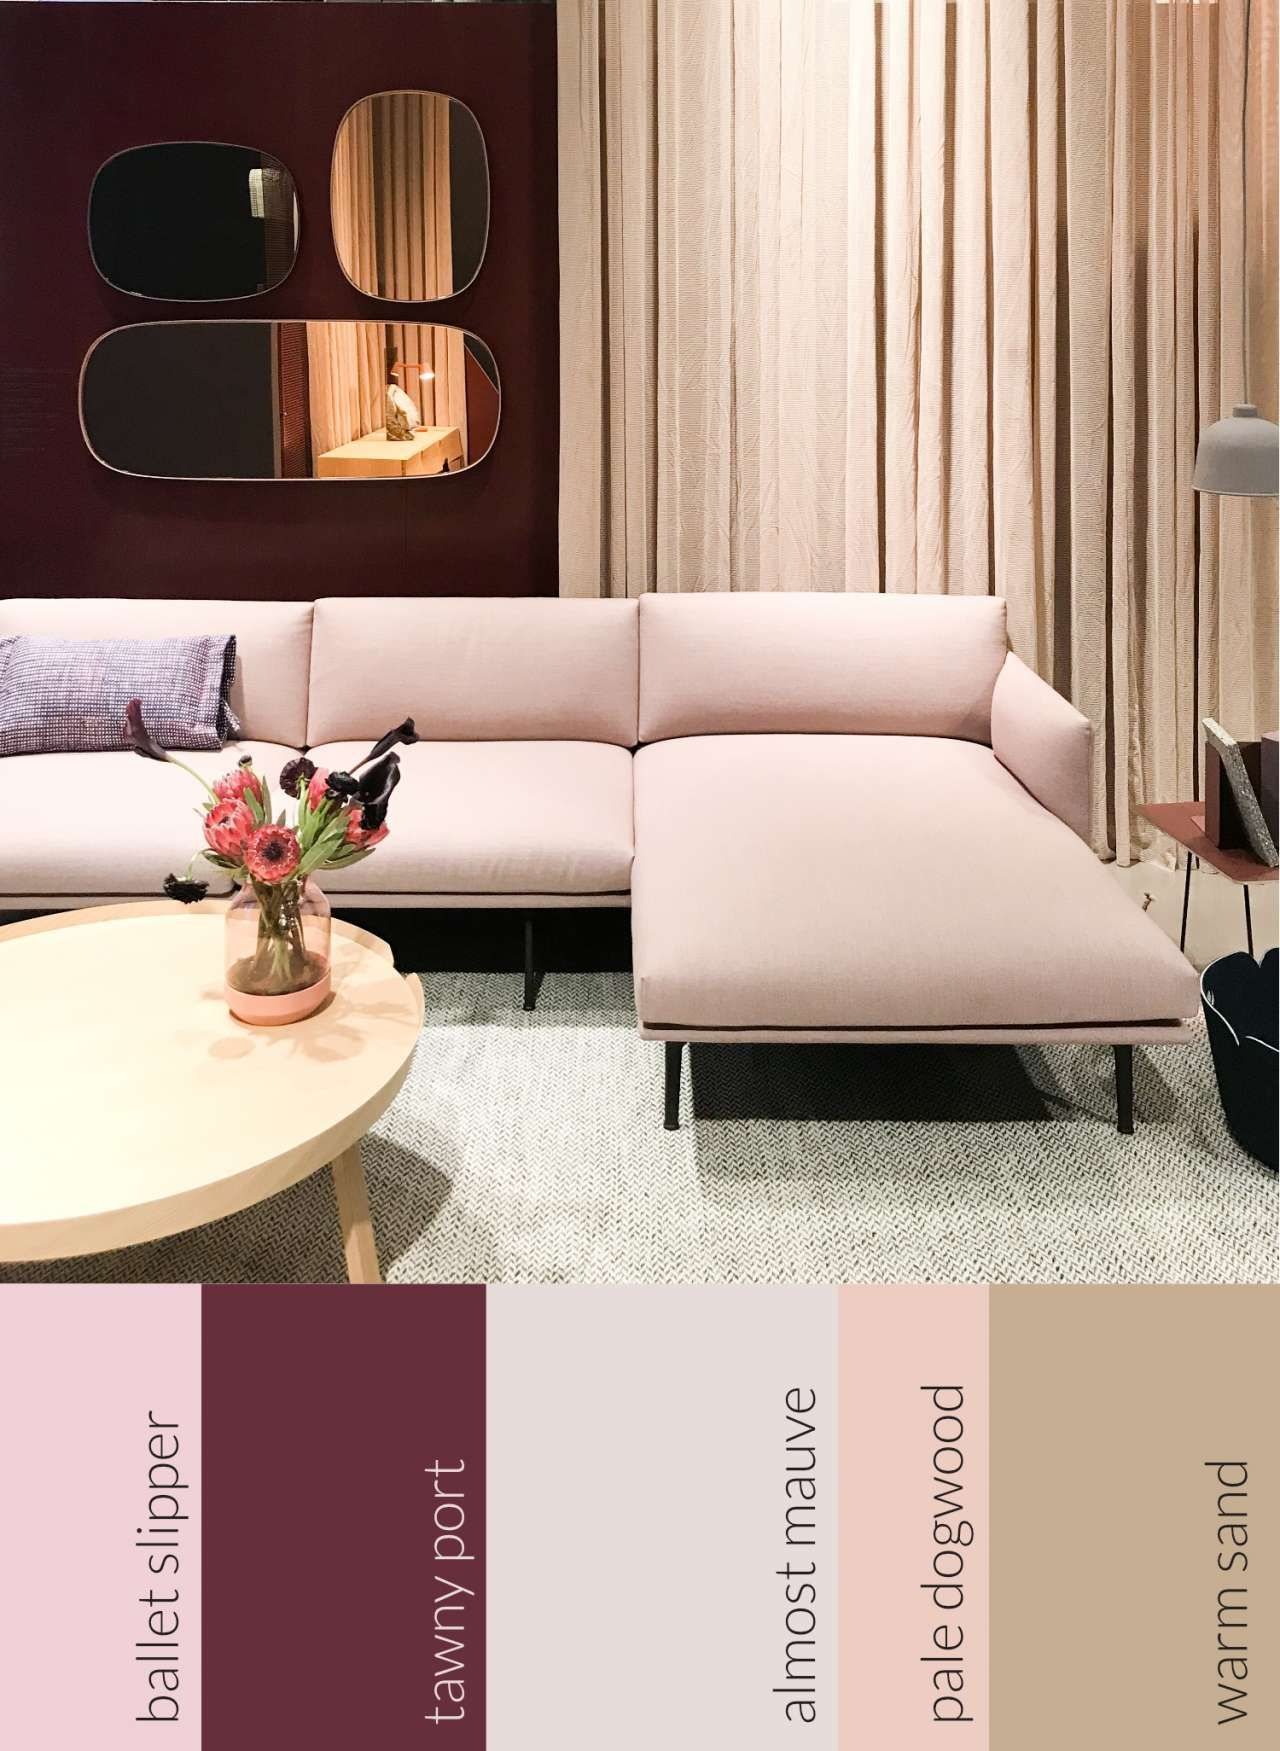 wohntrends und farben 2018 blogmix gruppenboard. Black Bedroom Furniture Sets. Home Design Ideas